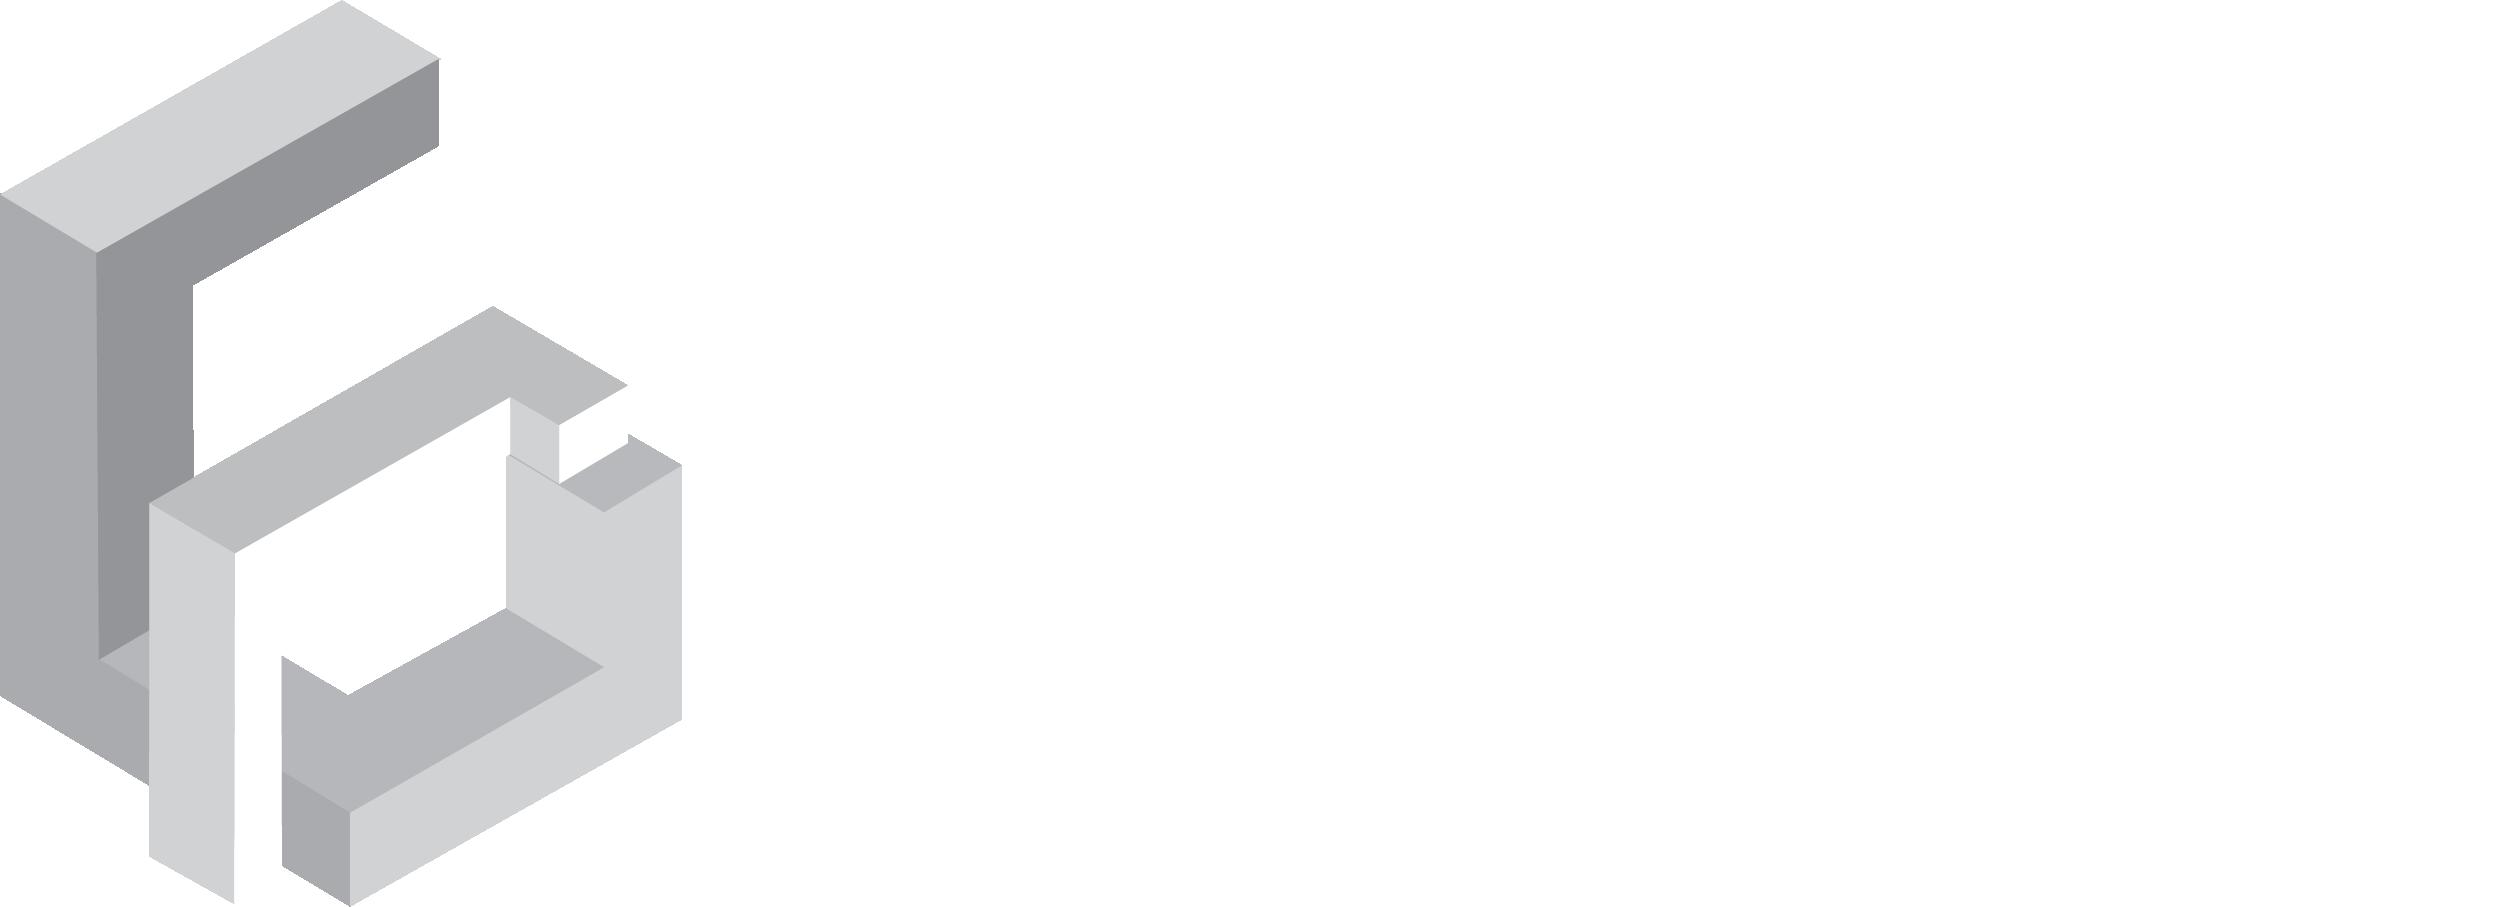 QCCS logo